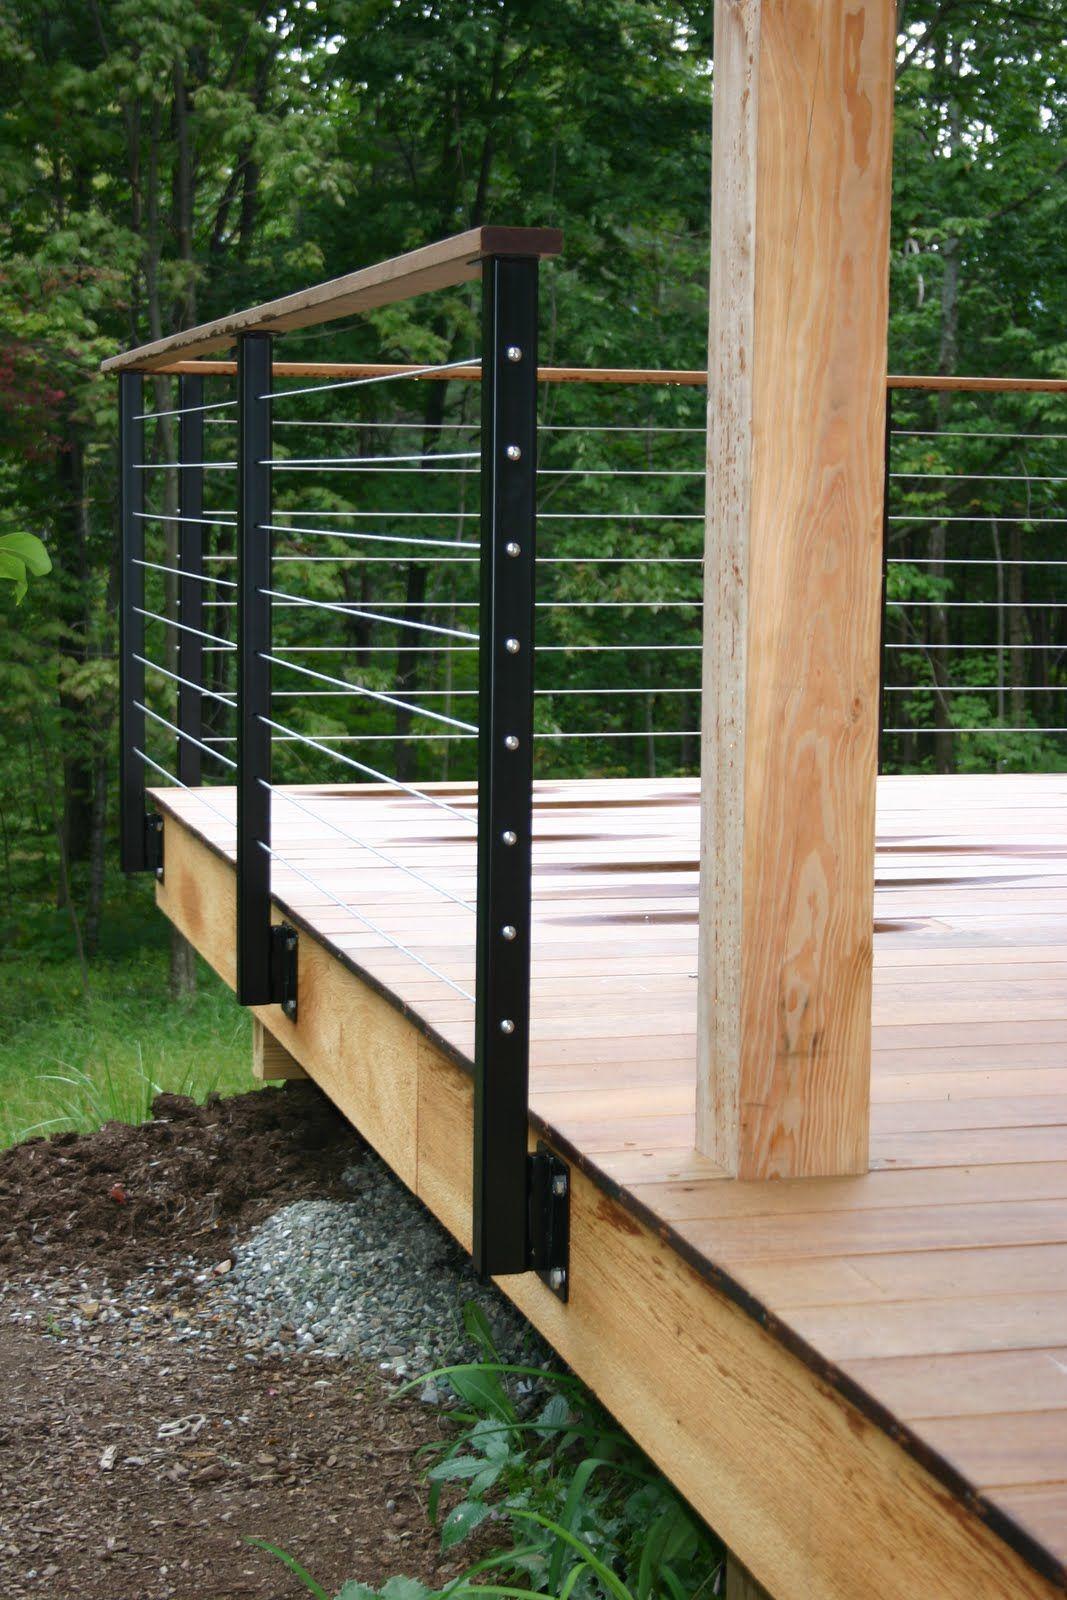 Modern Cabin Deck Railing Metal Railing Posts Wire Wood Decks in dimensions 1067 X 1600